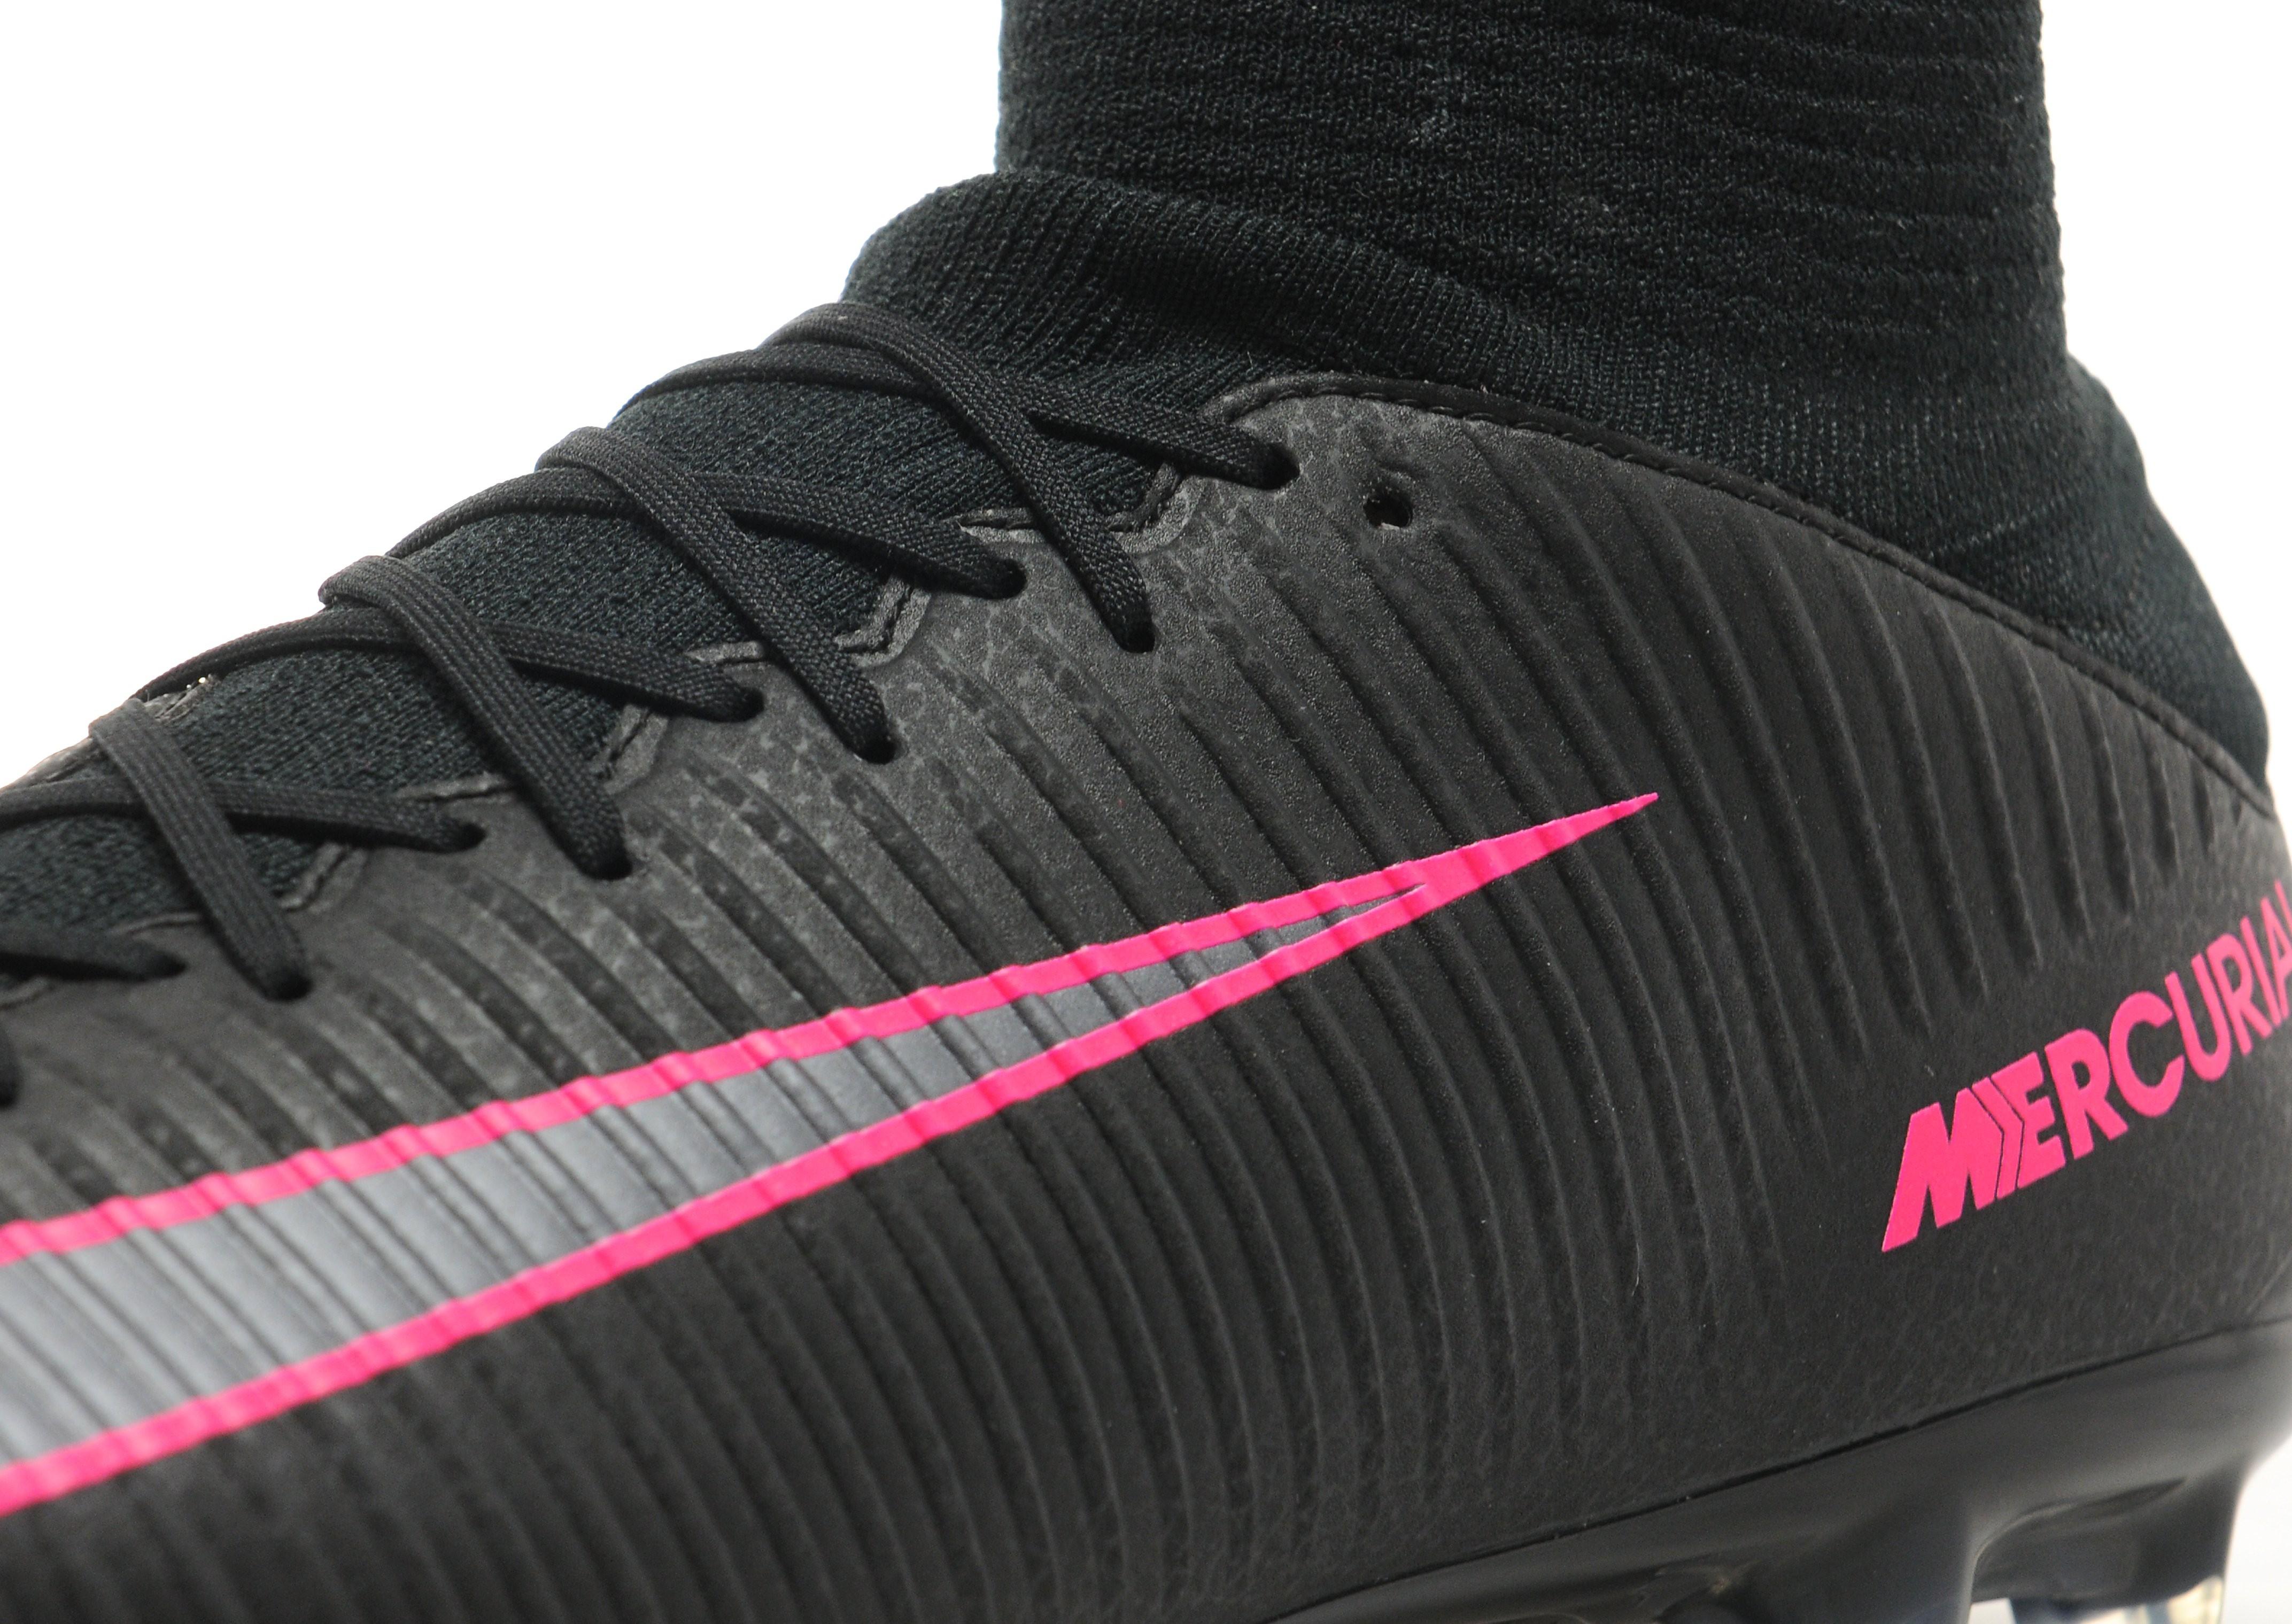 Nike Pitch Dark Mercurial Veloce III DF FG